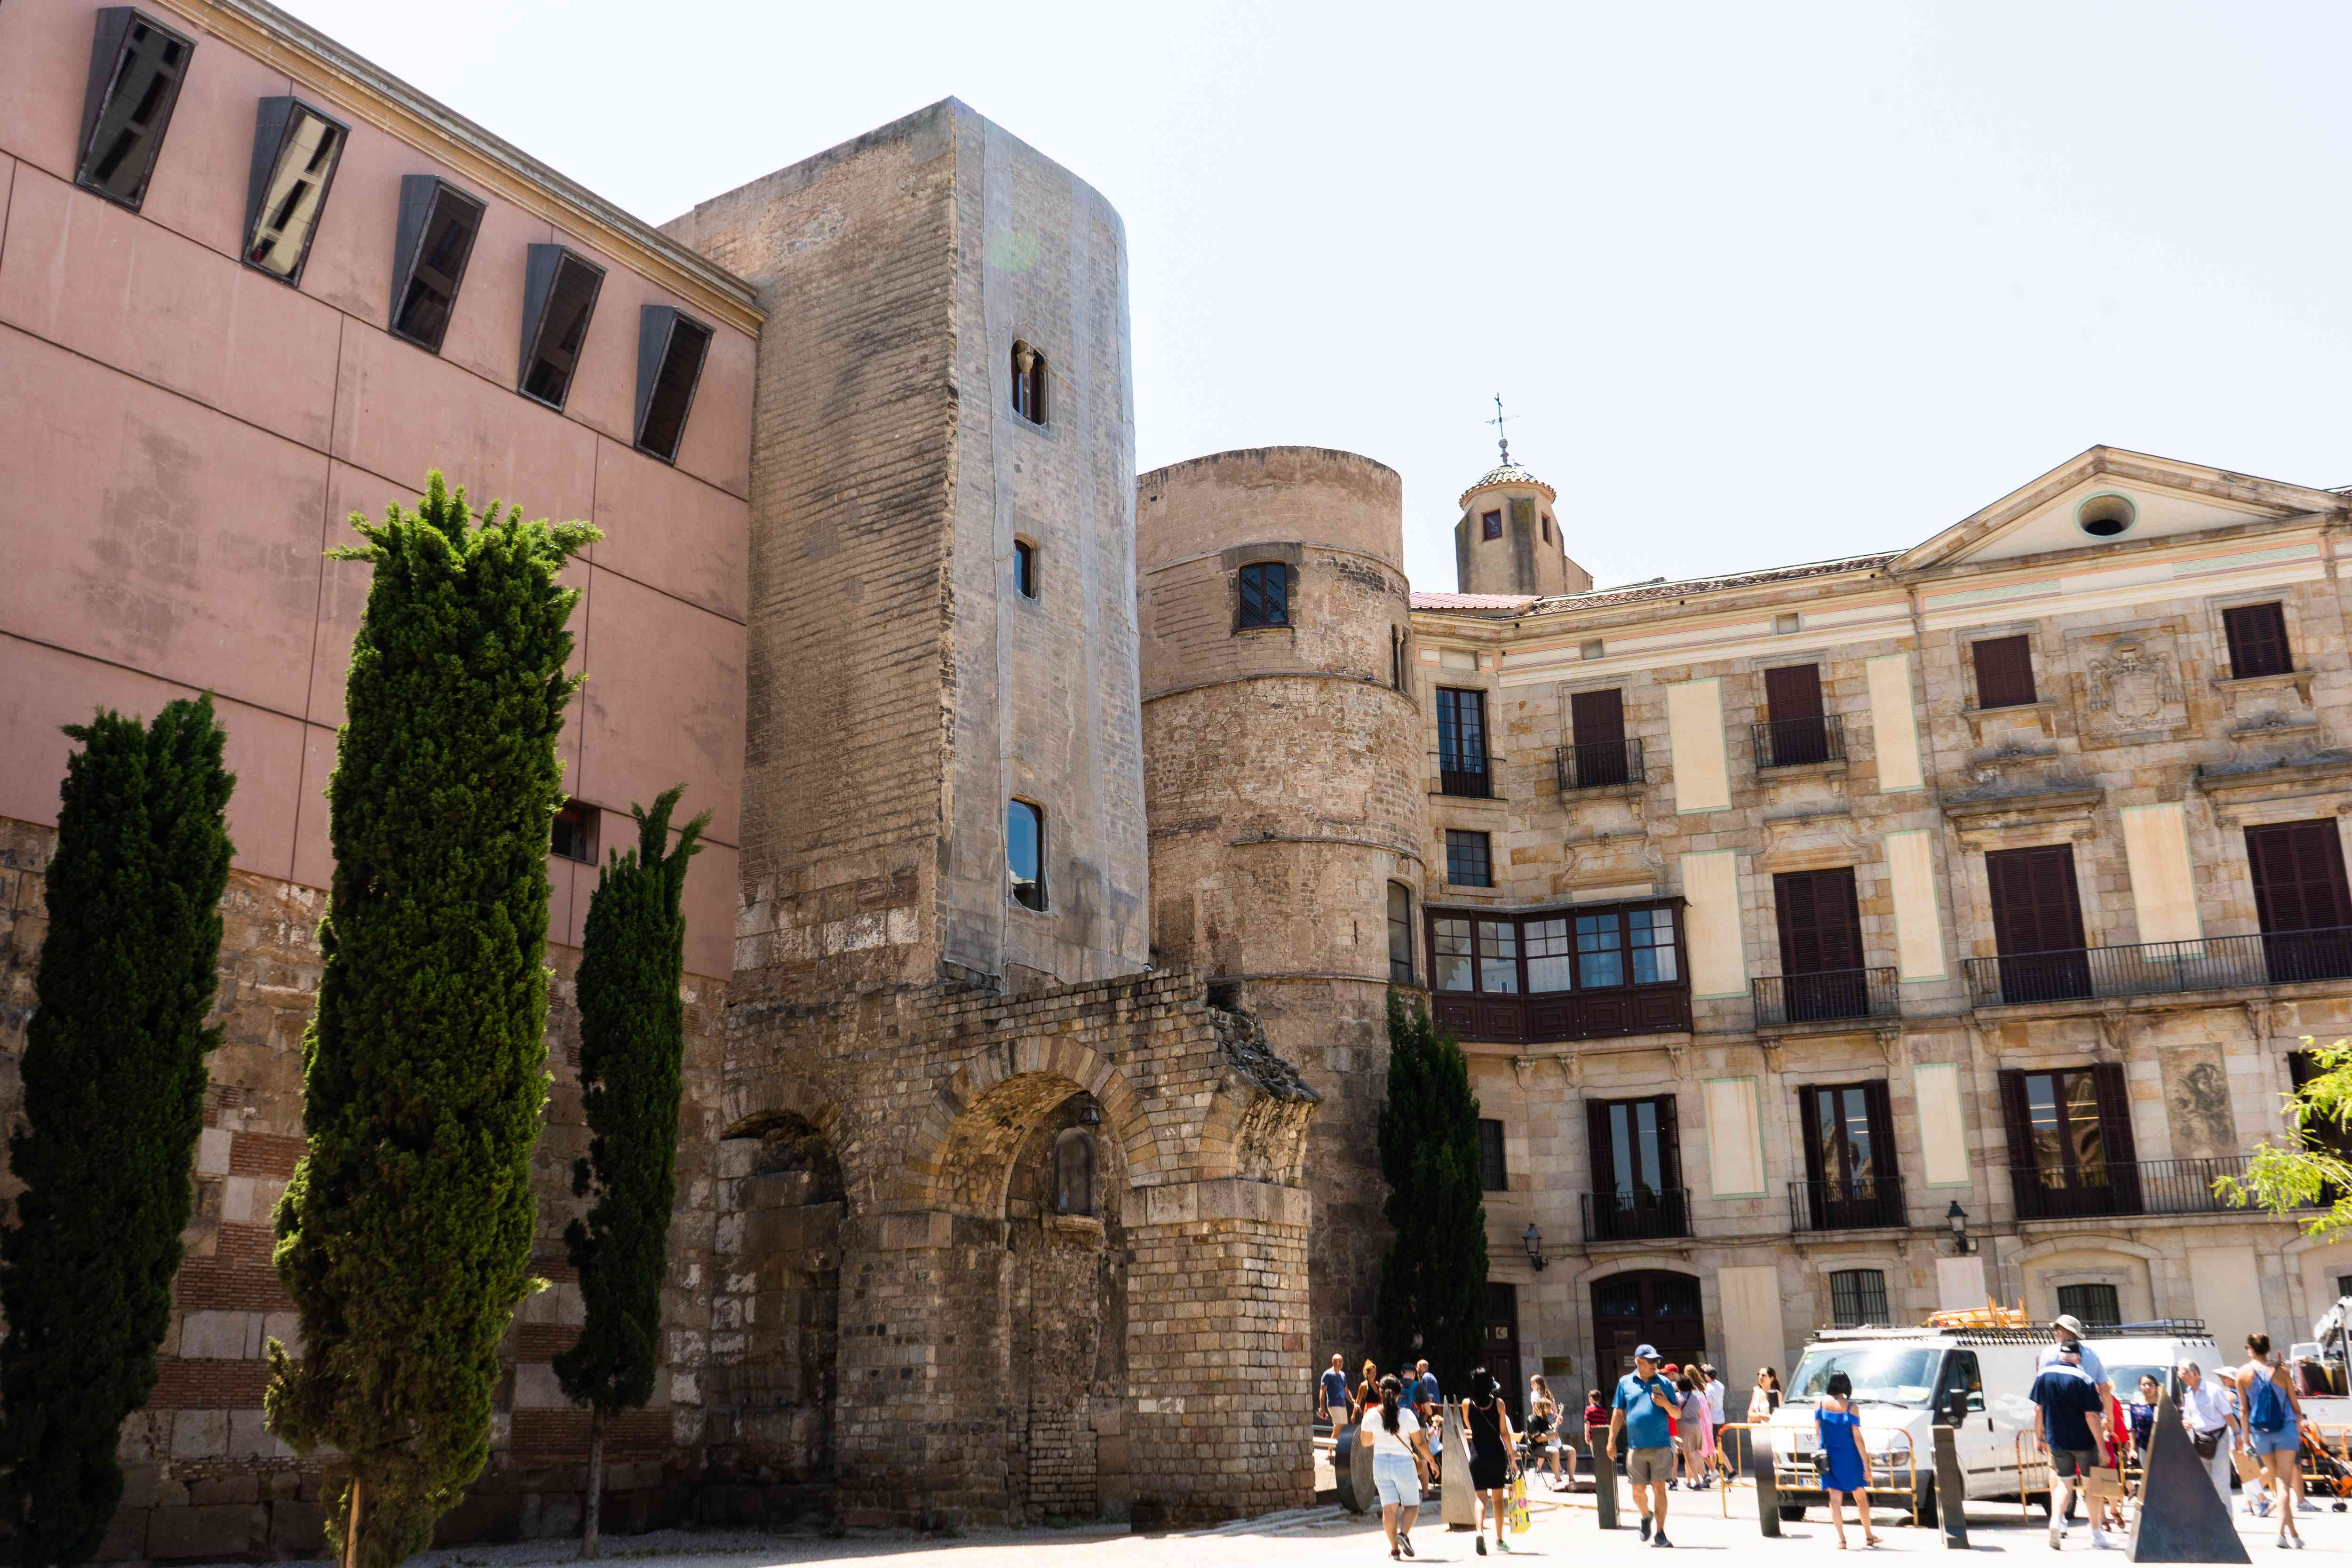 Roman Ruins in Portal del Bisbe, Barcelona